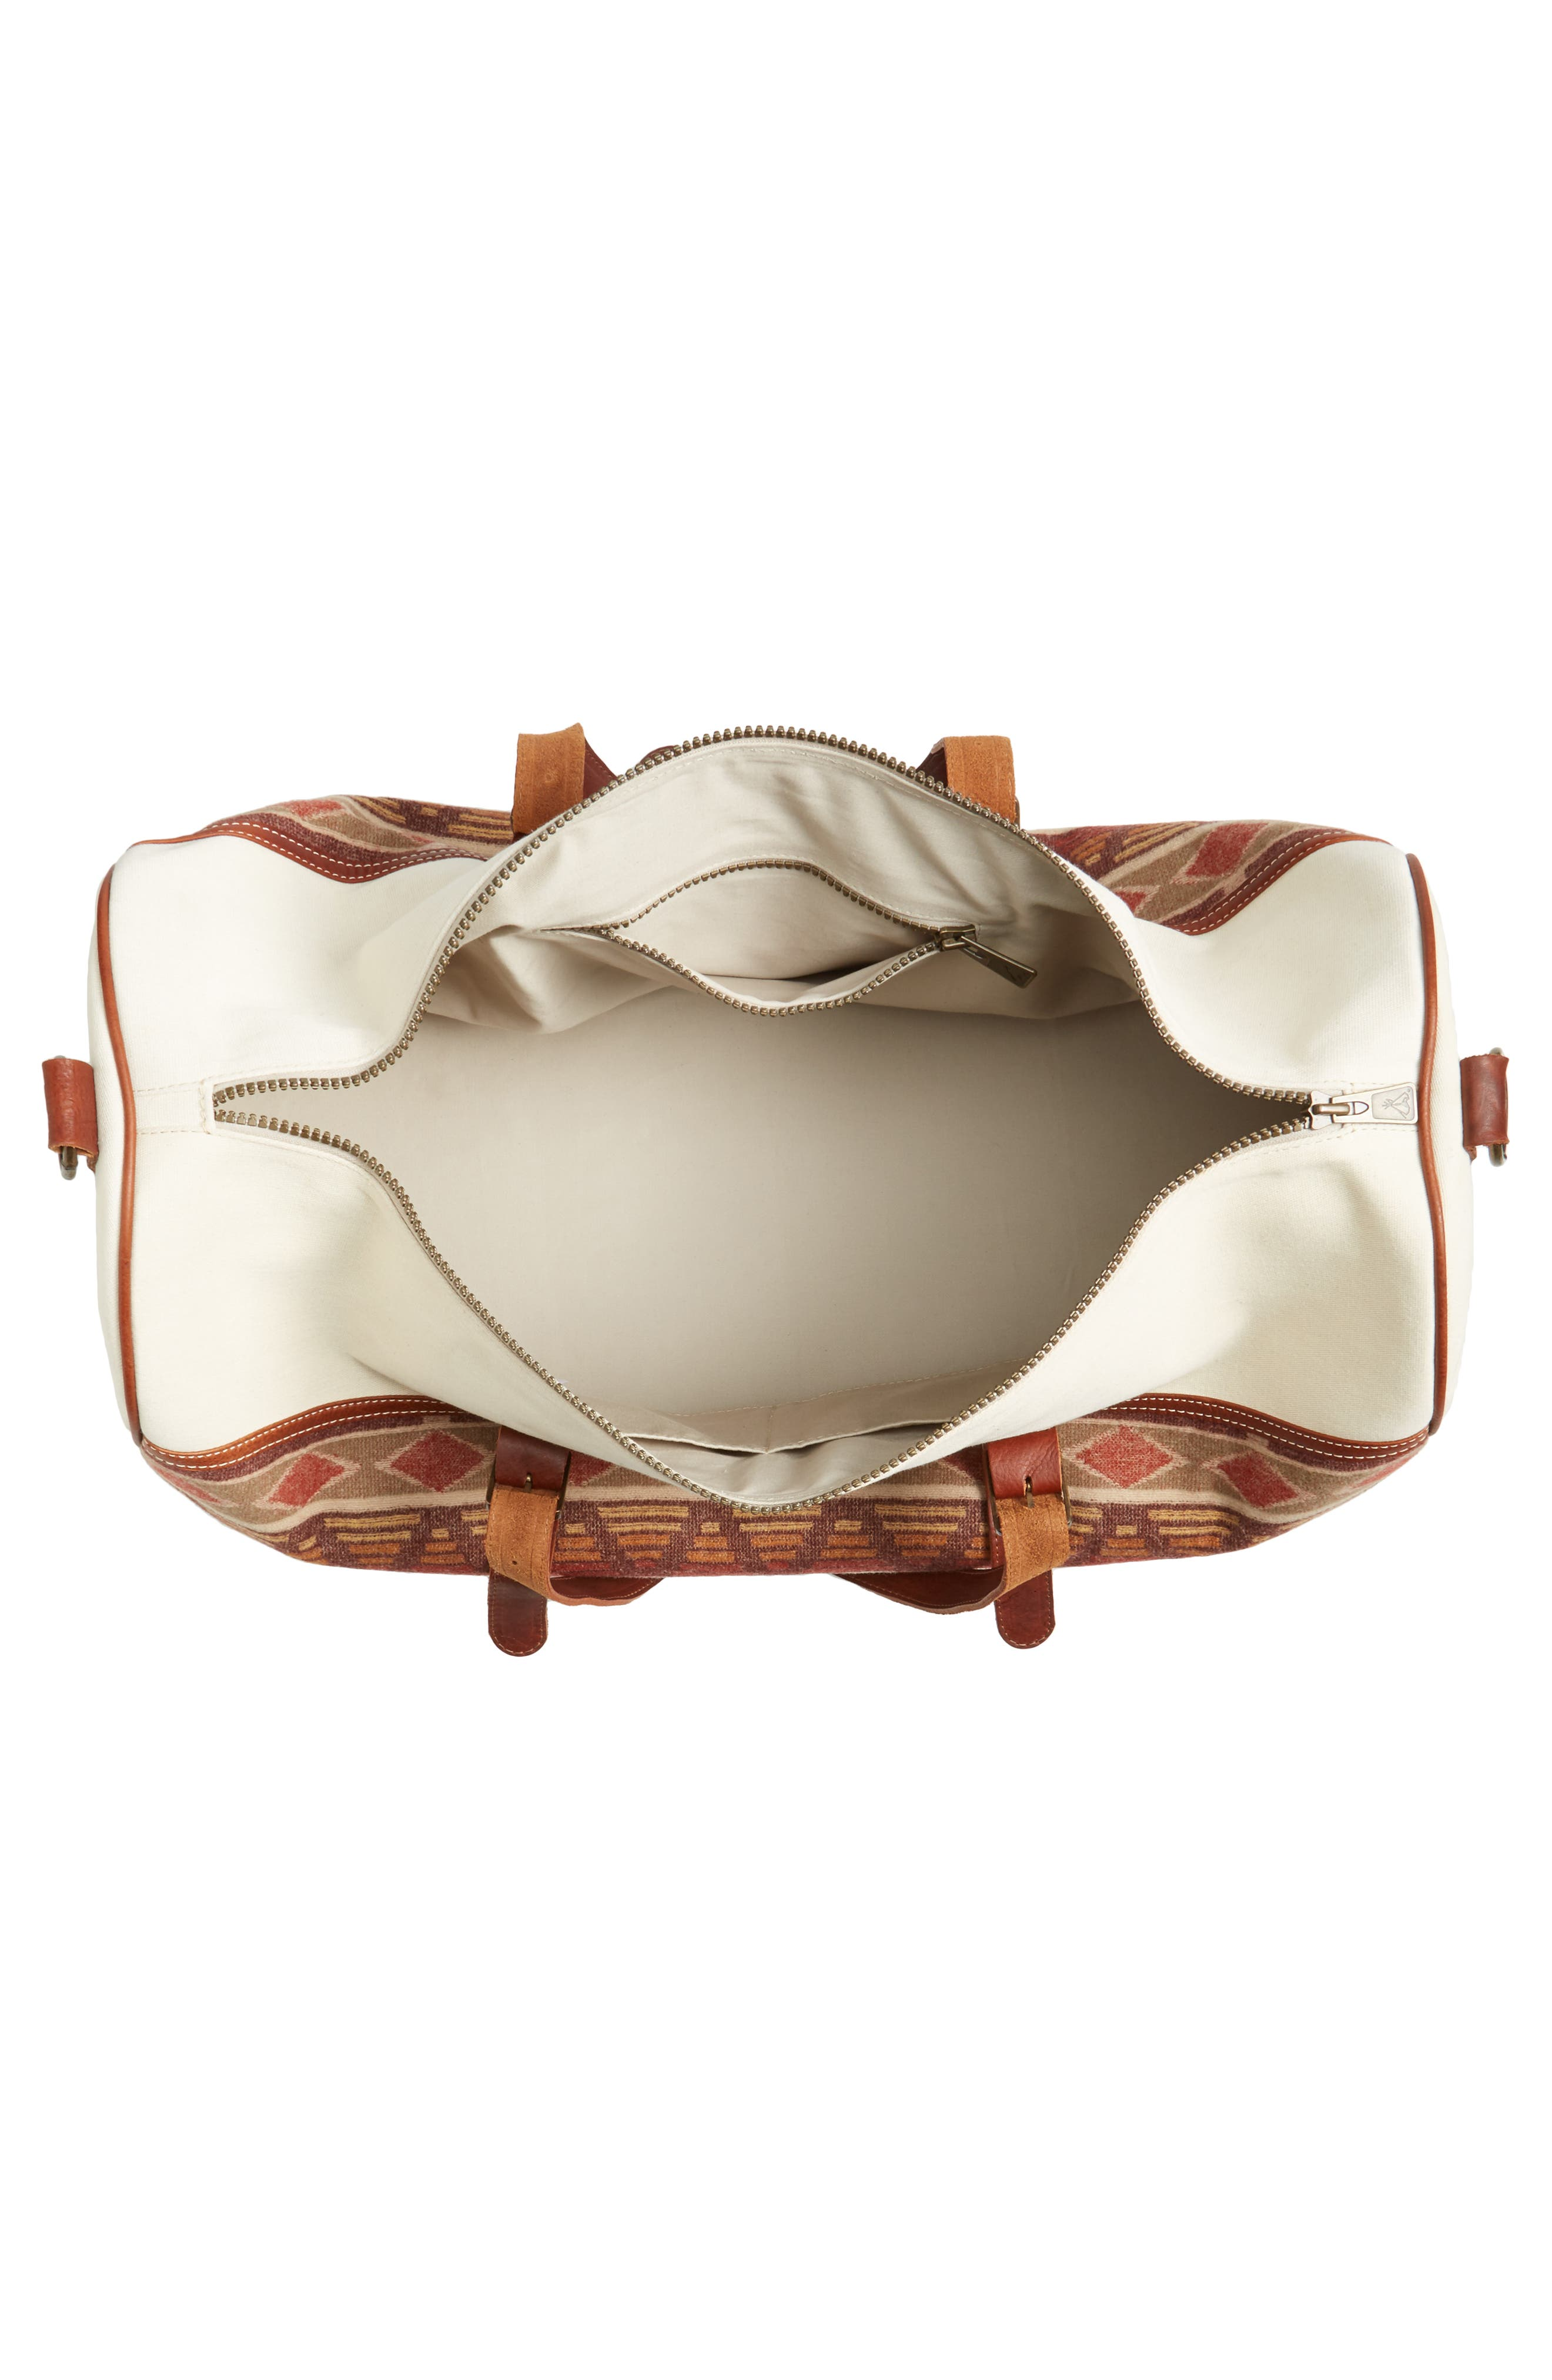 Voyager Duffel Bag,                             Alternate thumbnail 4, color,                             Cedar Mountain